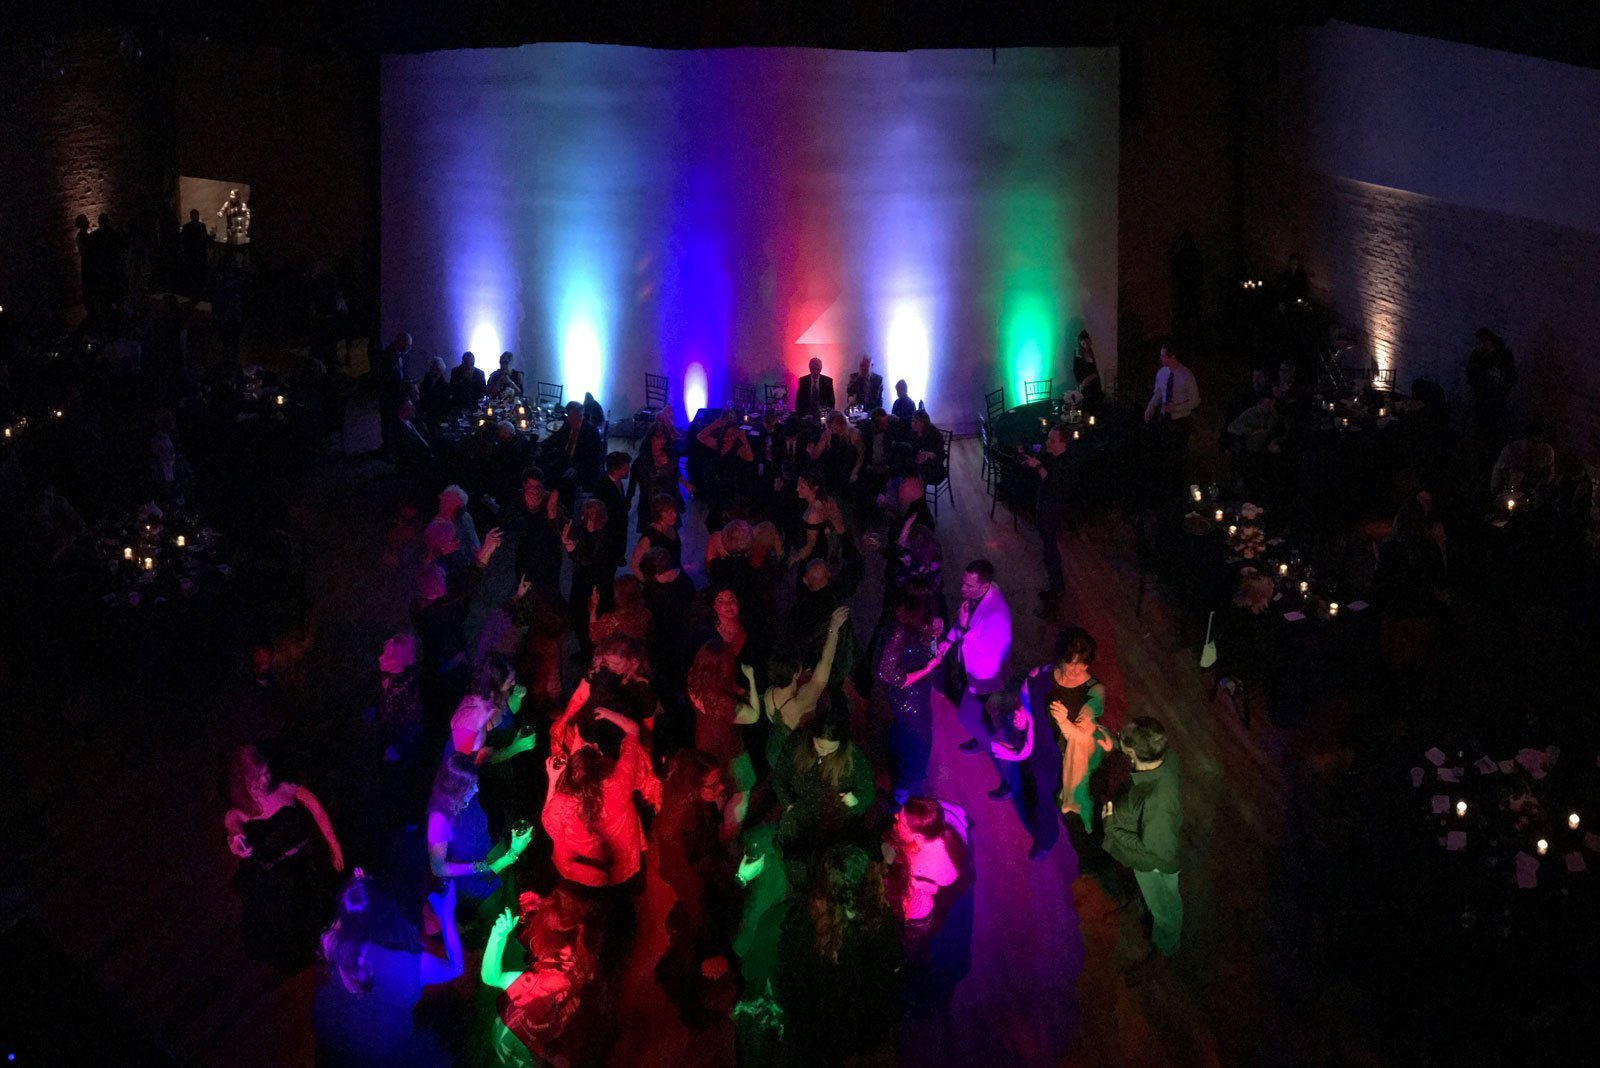 dance-floor-at-the-harris-building